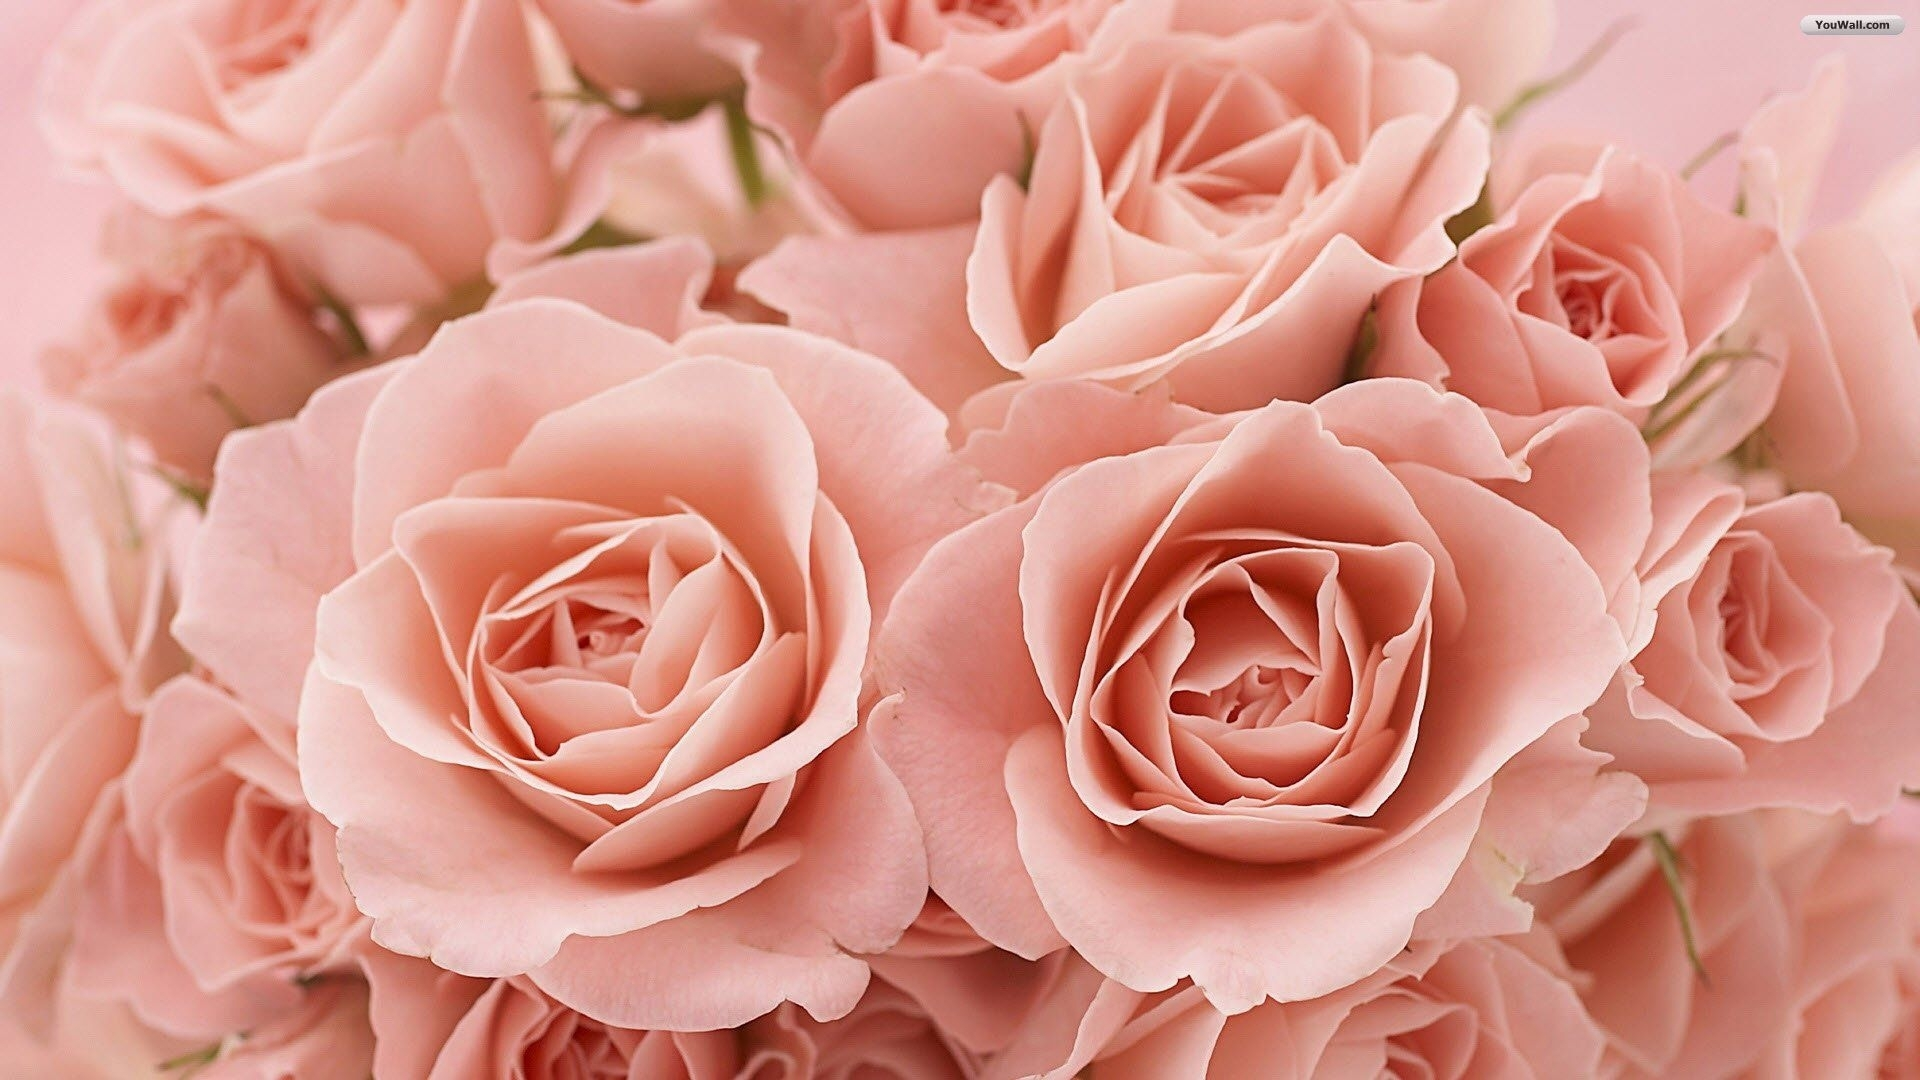 light pink roses background tumblr light pink roses tumblr